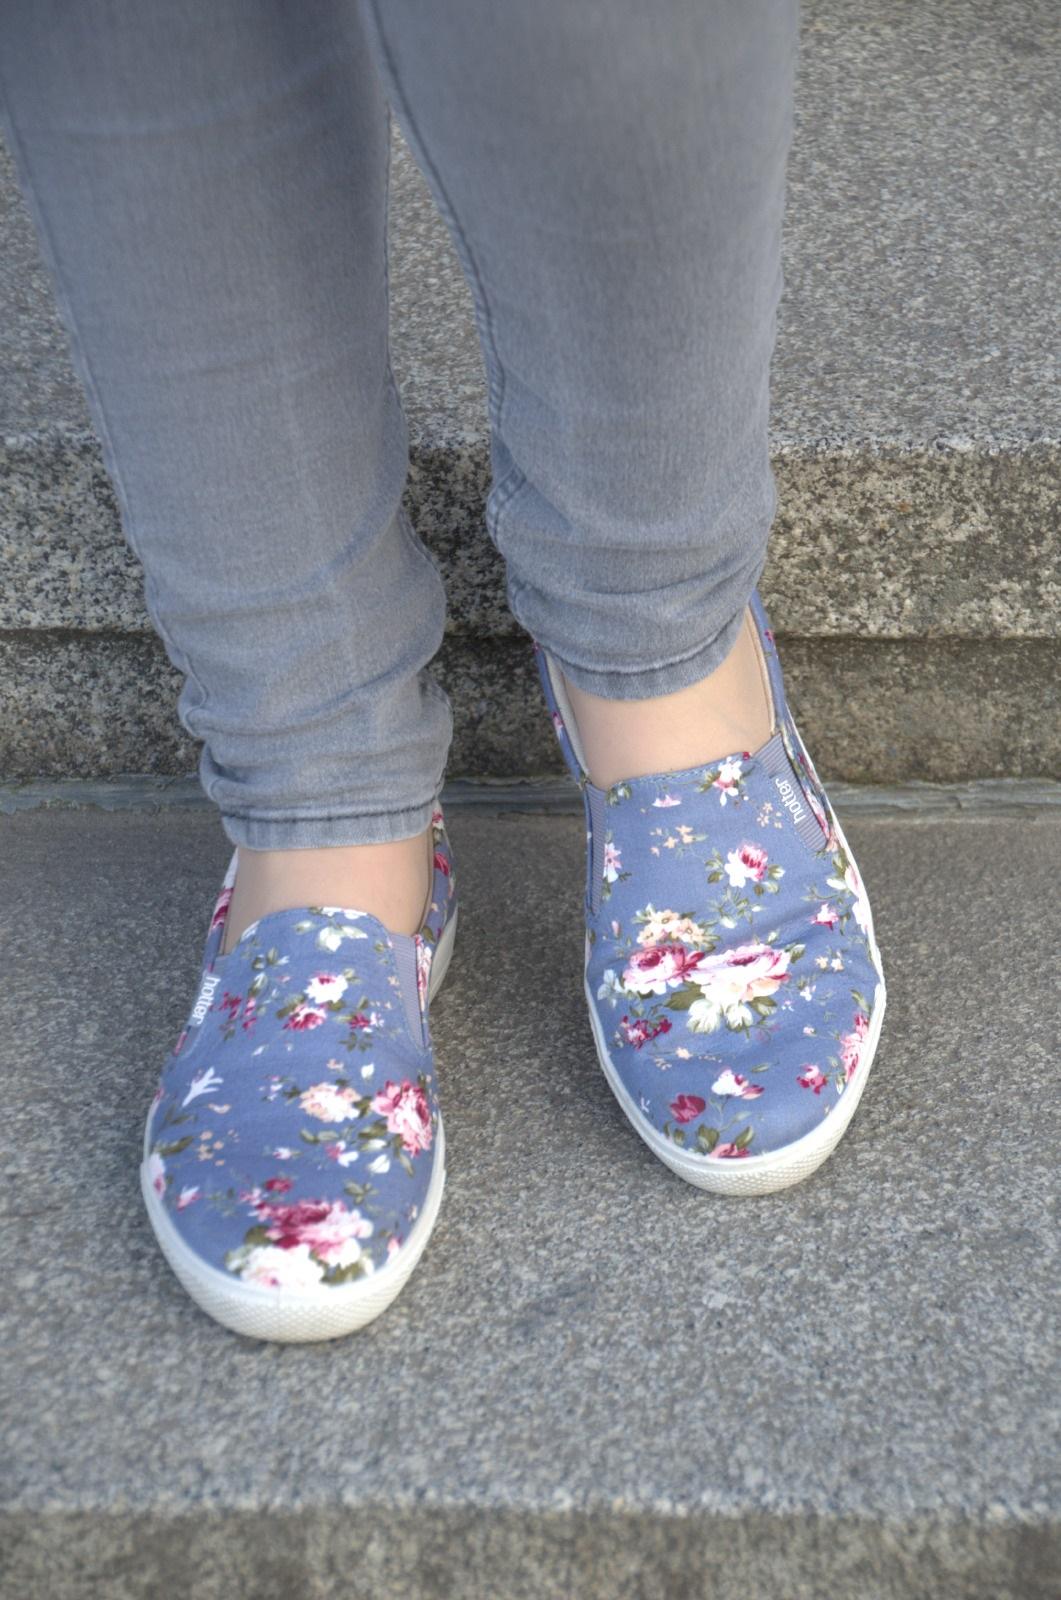 Hotter Shoes in Berlin